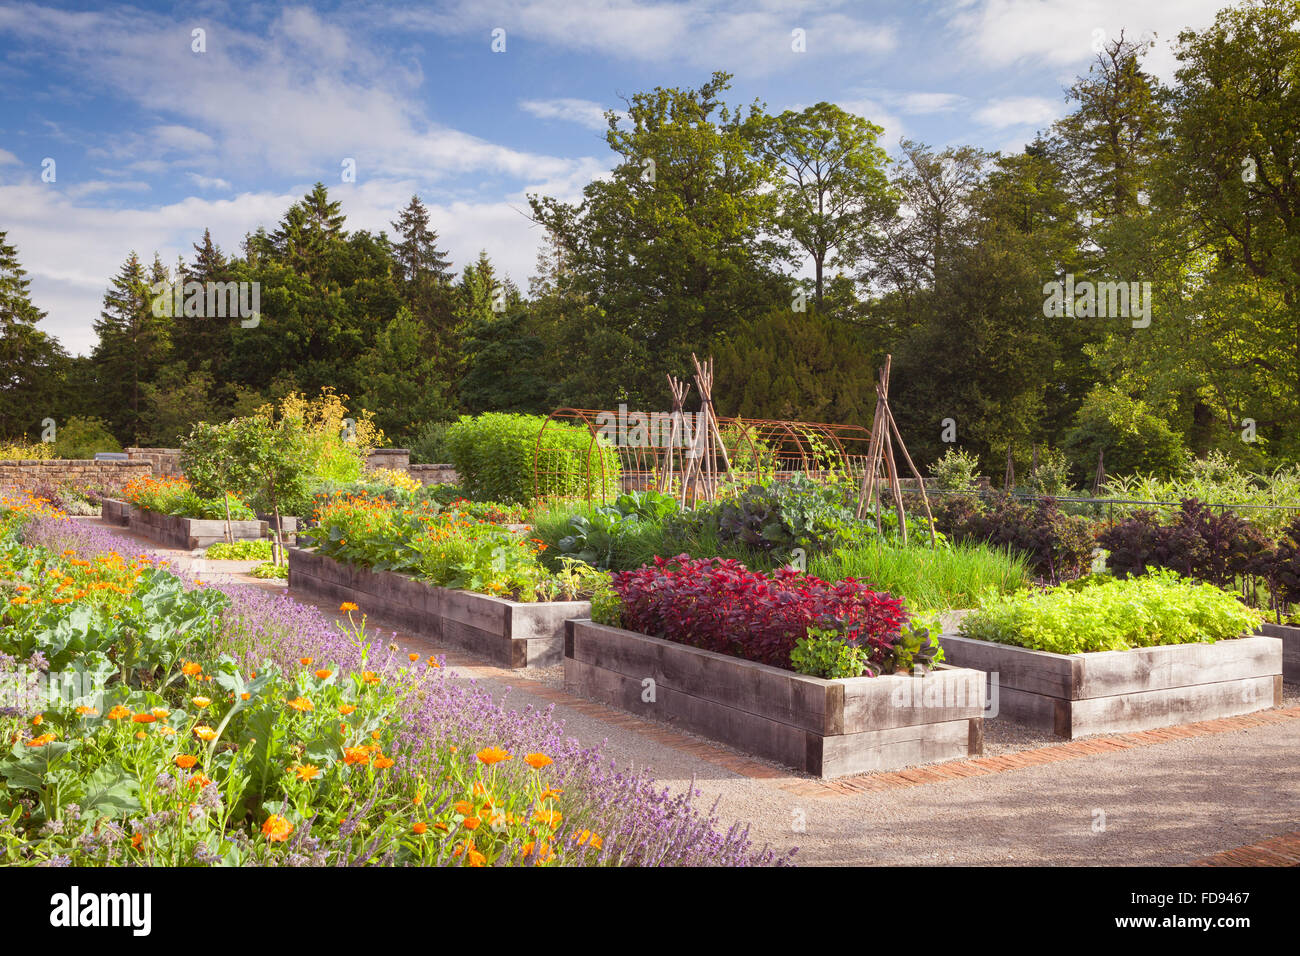 Raised Beds Made Of Quercus Robur English Oak The Kitchen Garden Stock Photo Alamy